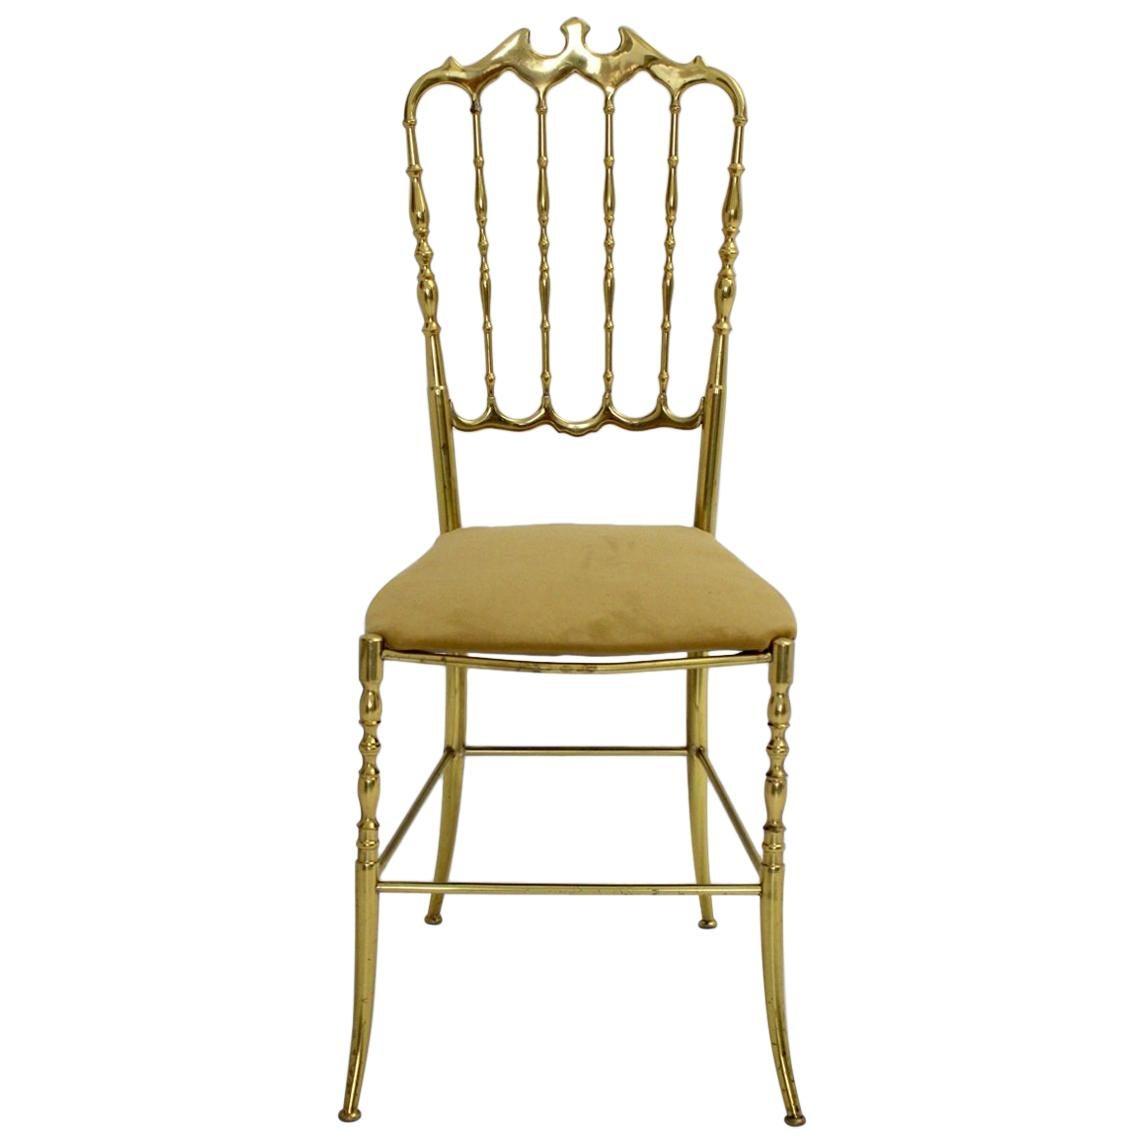 Mid Century Modern Vintage Brass Chiavari Side Chair, 1950s, Italy